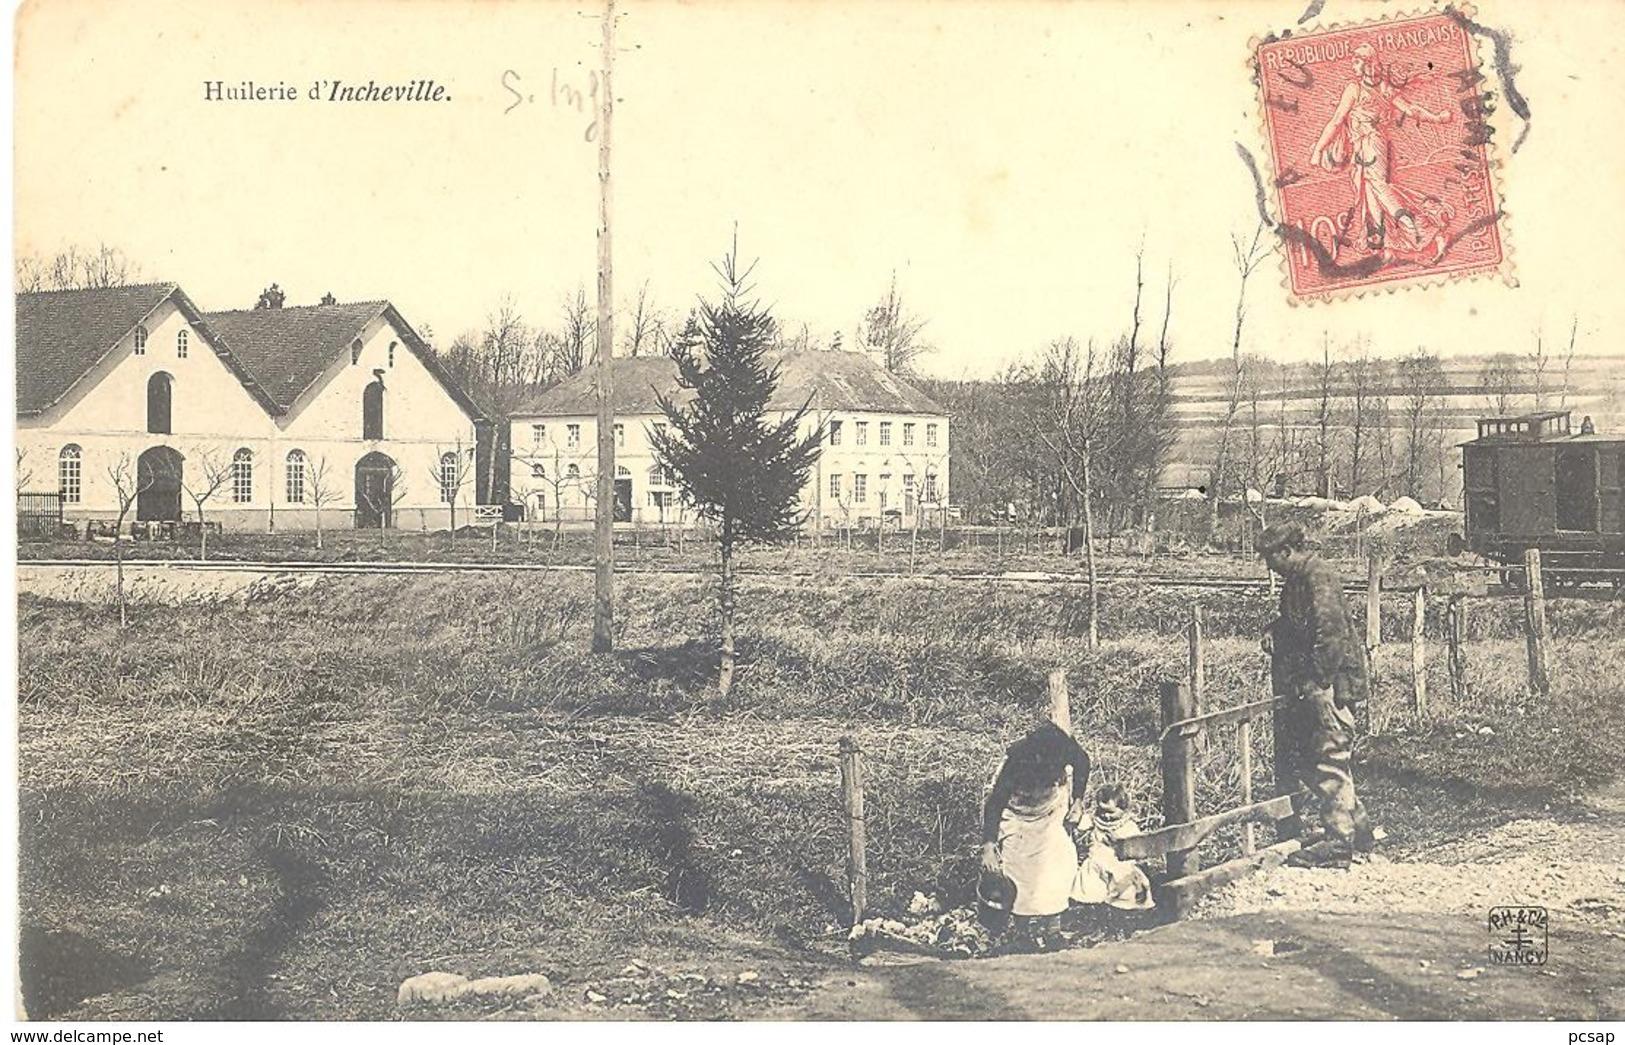 Huilerie D'Incheville - France